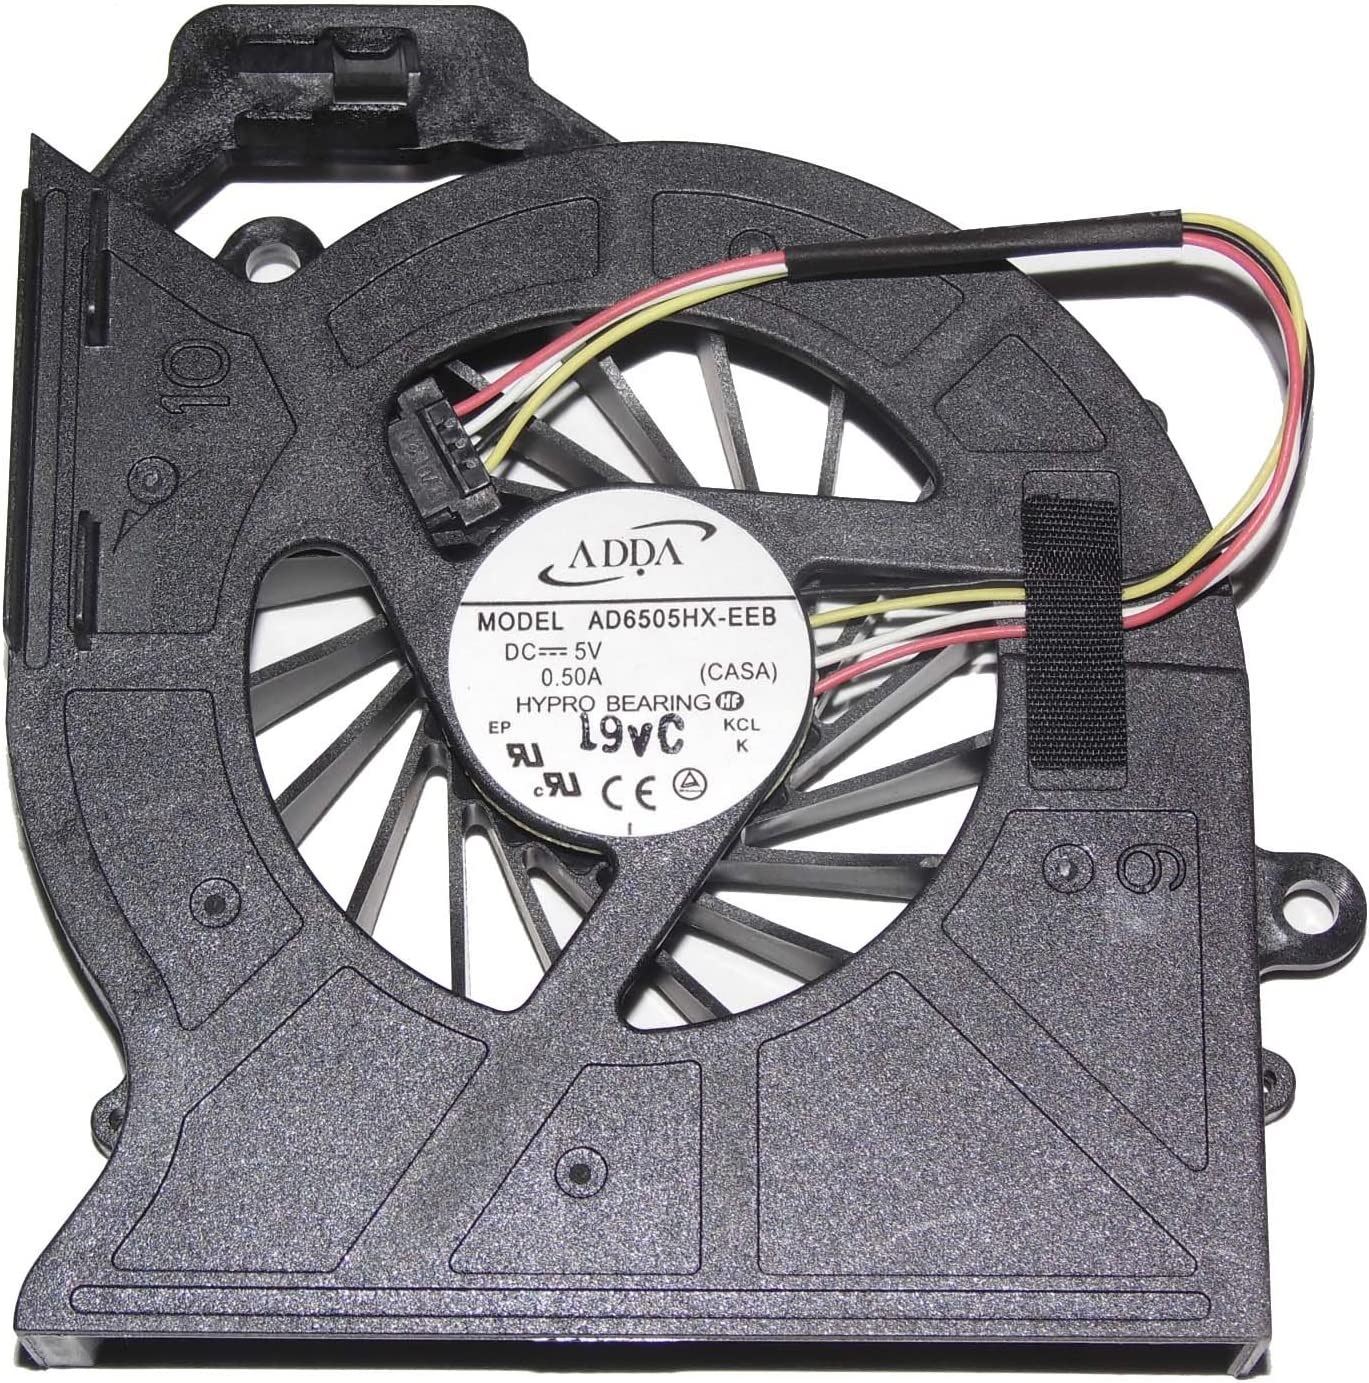 ADDA AD6505HX-EEB 5V 0.5A 4Wire For HP Pavilion DV6 DV6-6000 DV6-6029 DV6-6050 DV6-6090 DV6-6100 DV7 DV7-6000 650797-001 CPU Fan